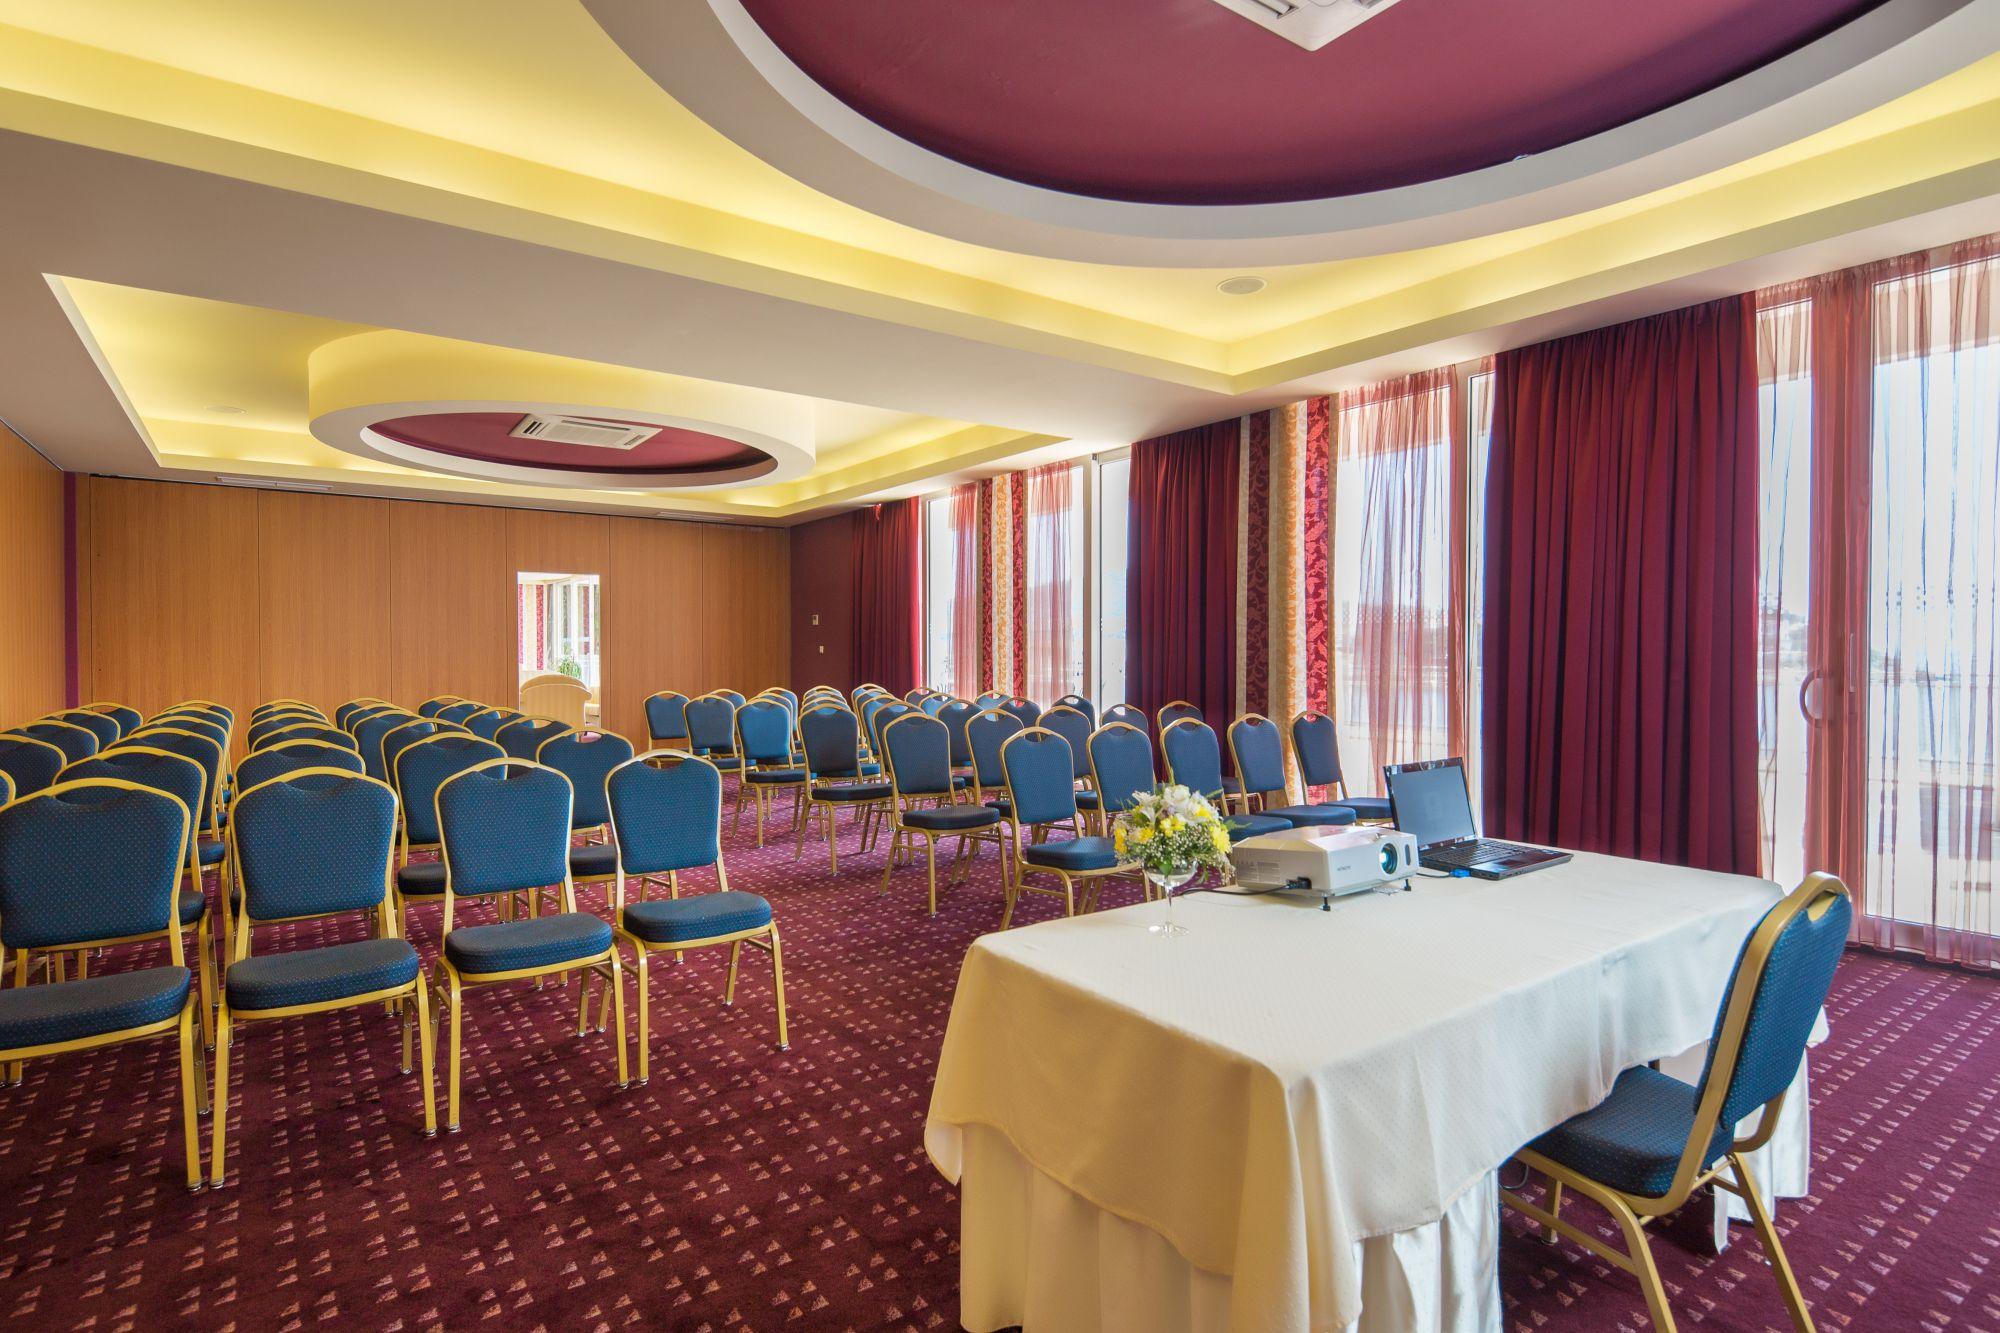 congress hall penkala ii 03 14639418809 o - Zora Hotel